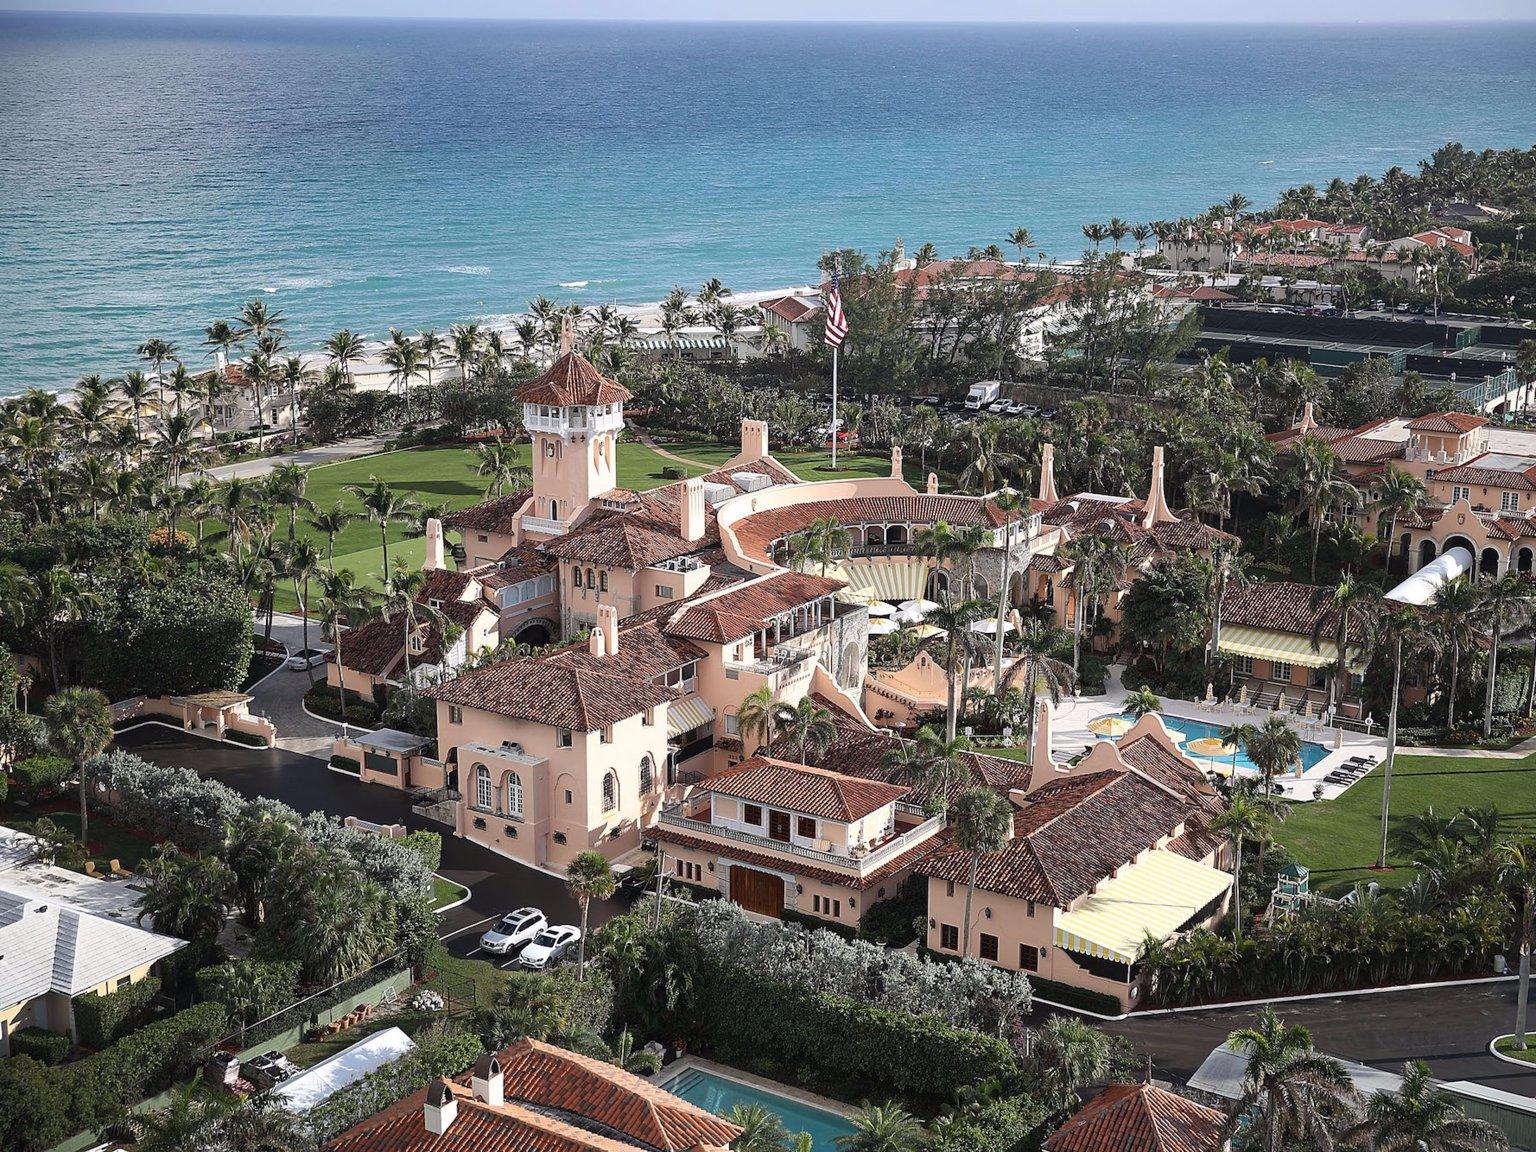 donald trump - trump51 1569235337 - Khối bất động sản hơn 122 triệu USD của Trump có gì?